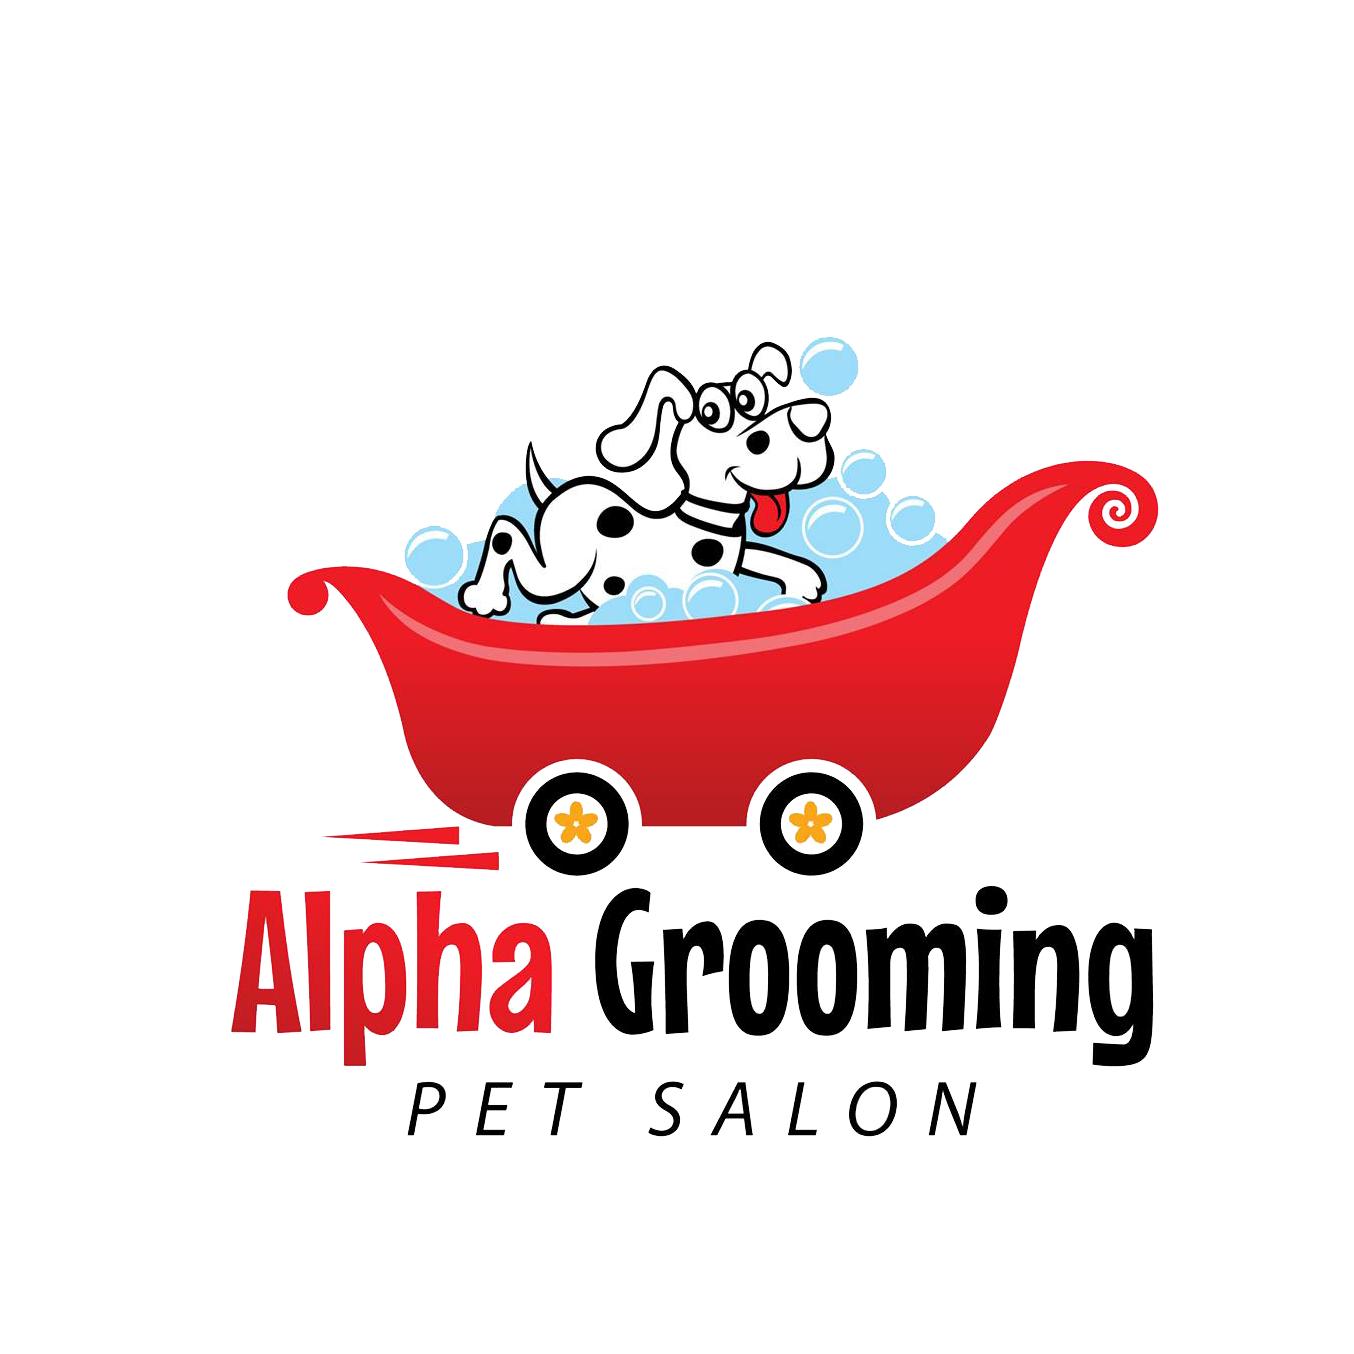 Alpha Grooming Pet Salon